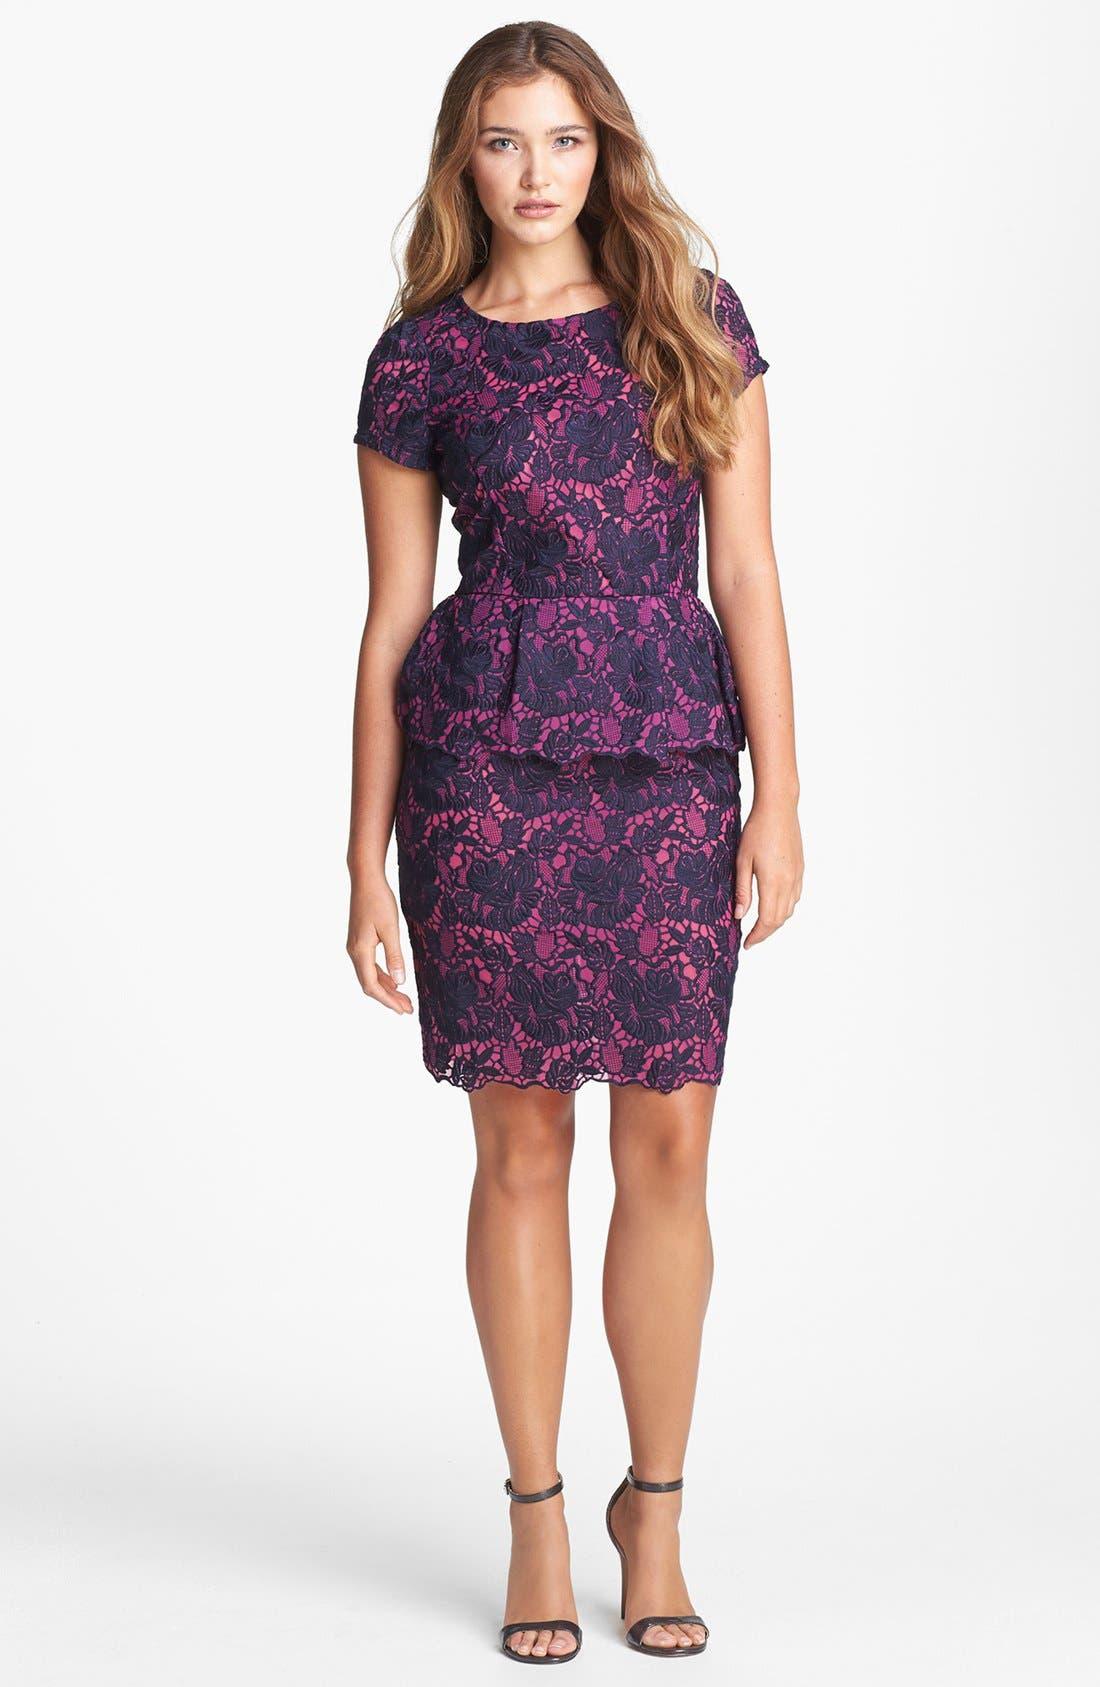 Alternate Image 1 Selected - Felicity & Coco Lace Peplum Sheath Dress (Regular & Petite) (Nordstrom Exclusive)